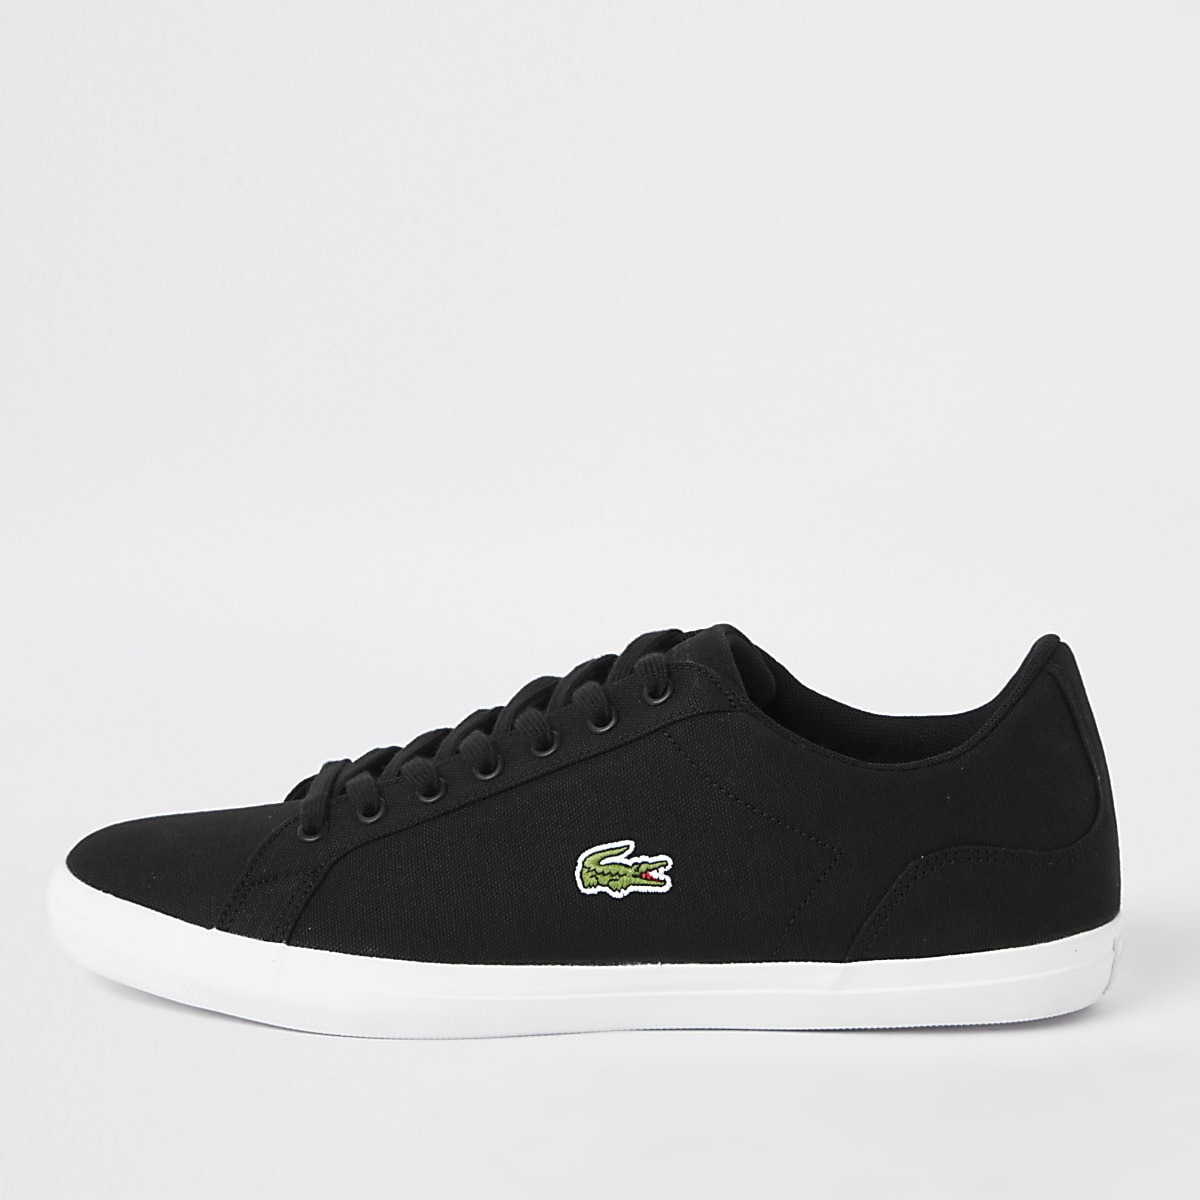 Lacoste Lerond black sneakers